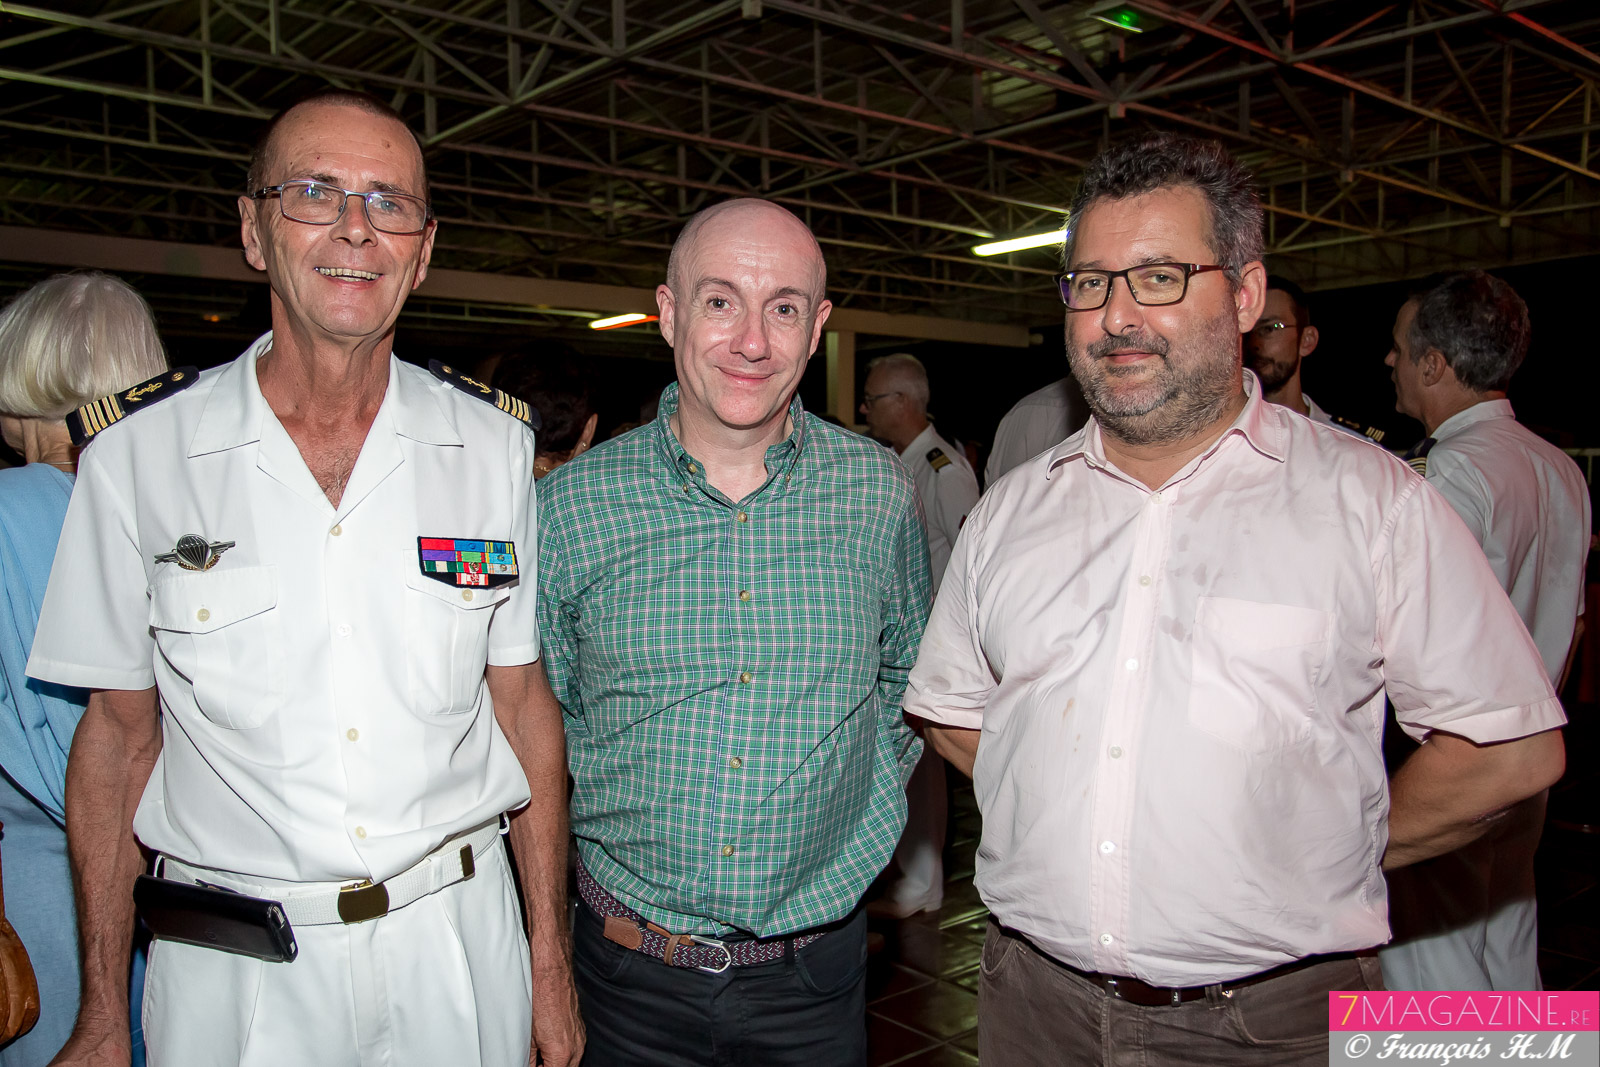 Bernard Salva, Docteur Eric Gamelin, psychiatre des hôpitaux, et Hervé Charlanes, expert-comptable